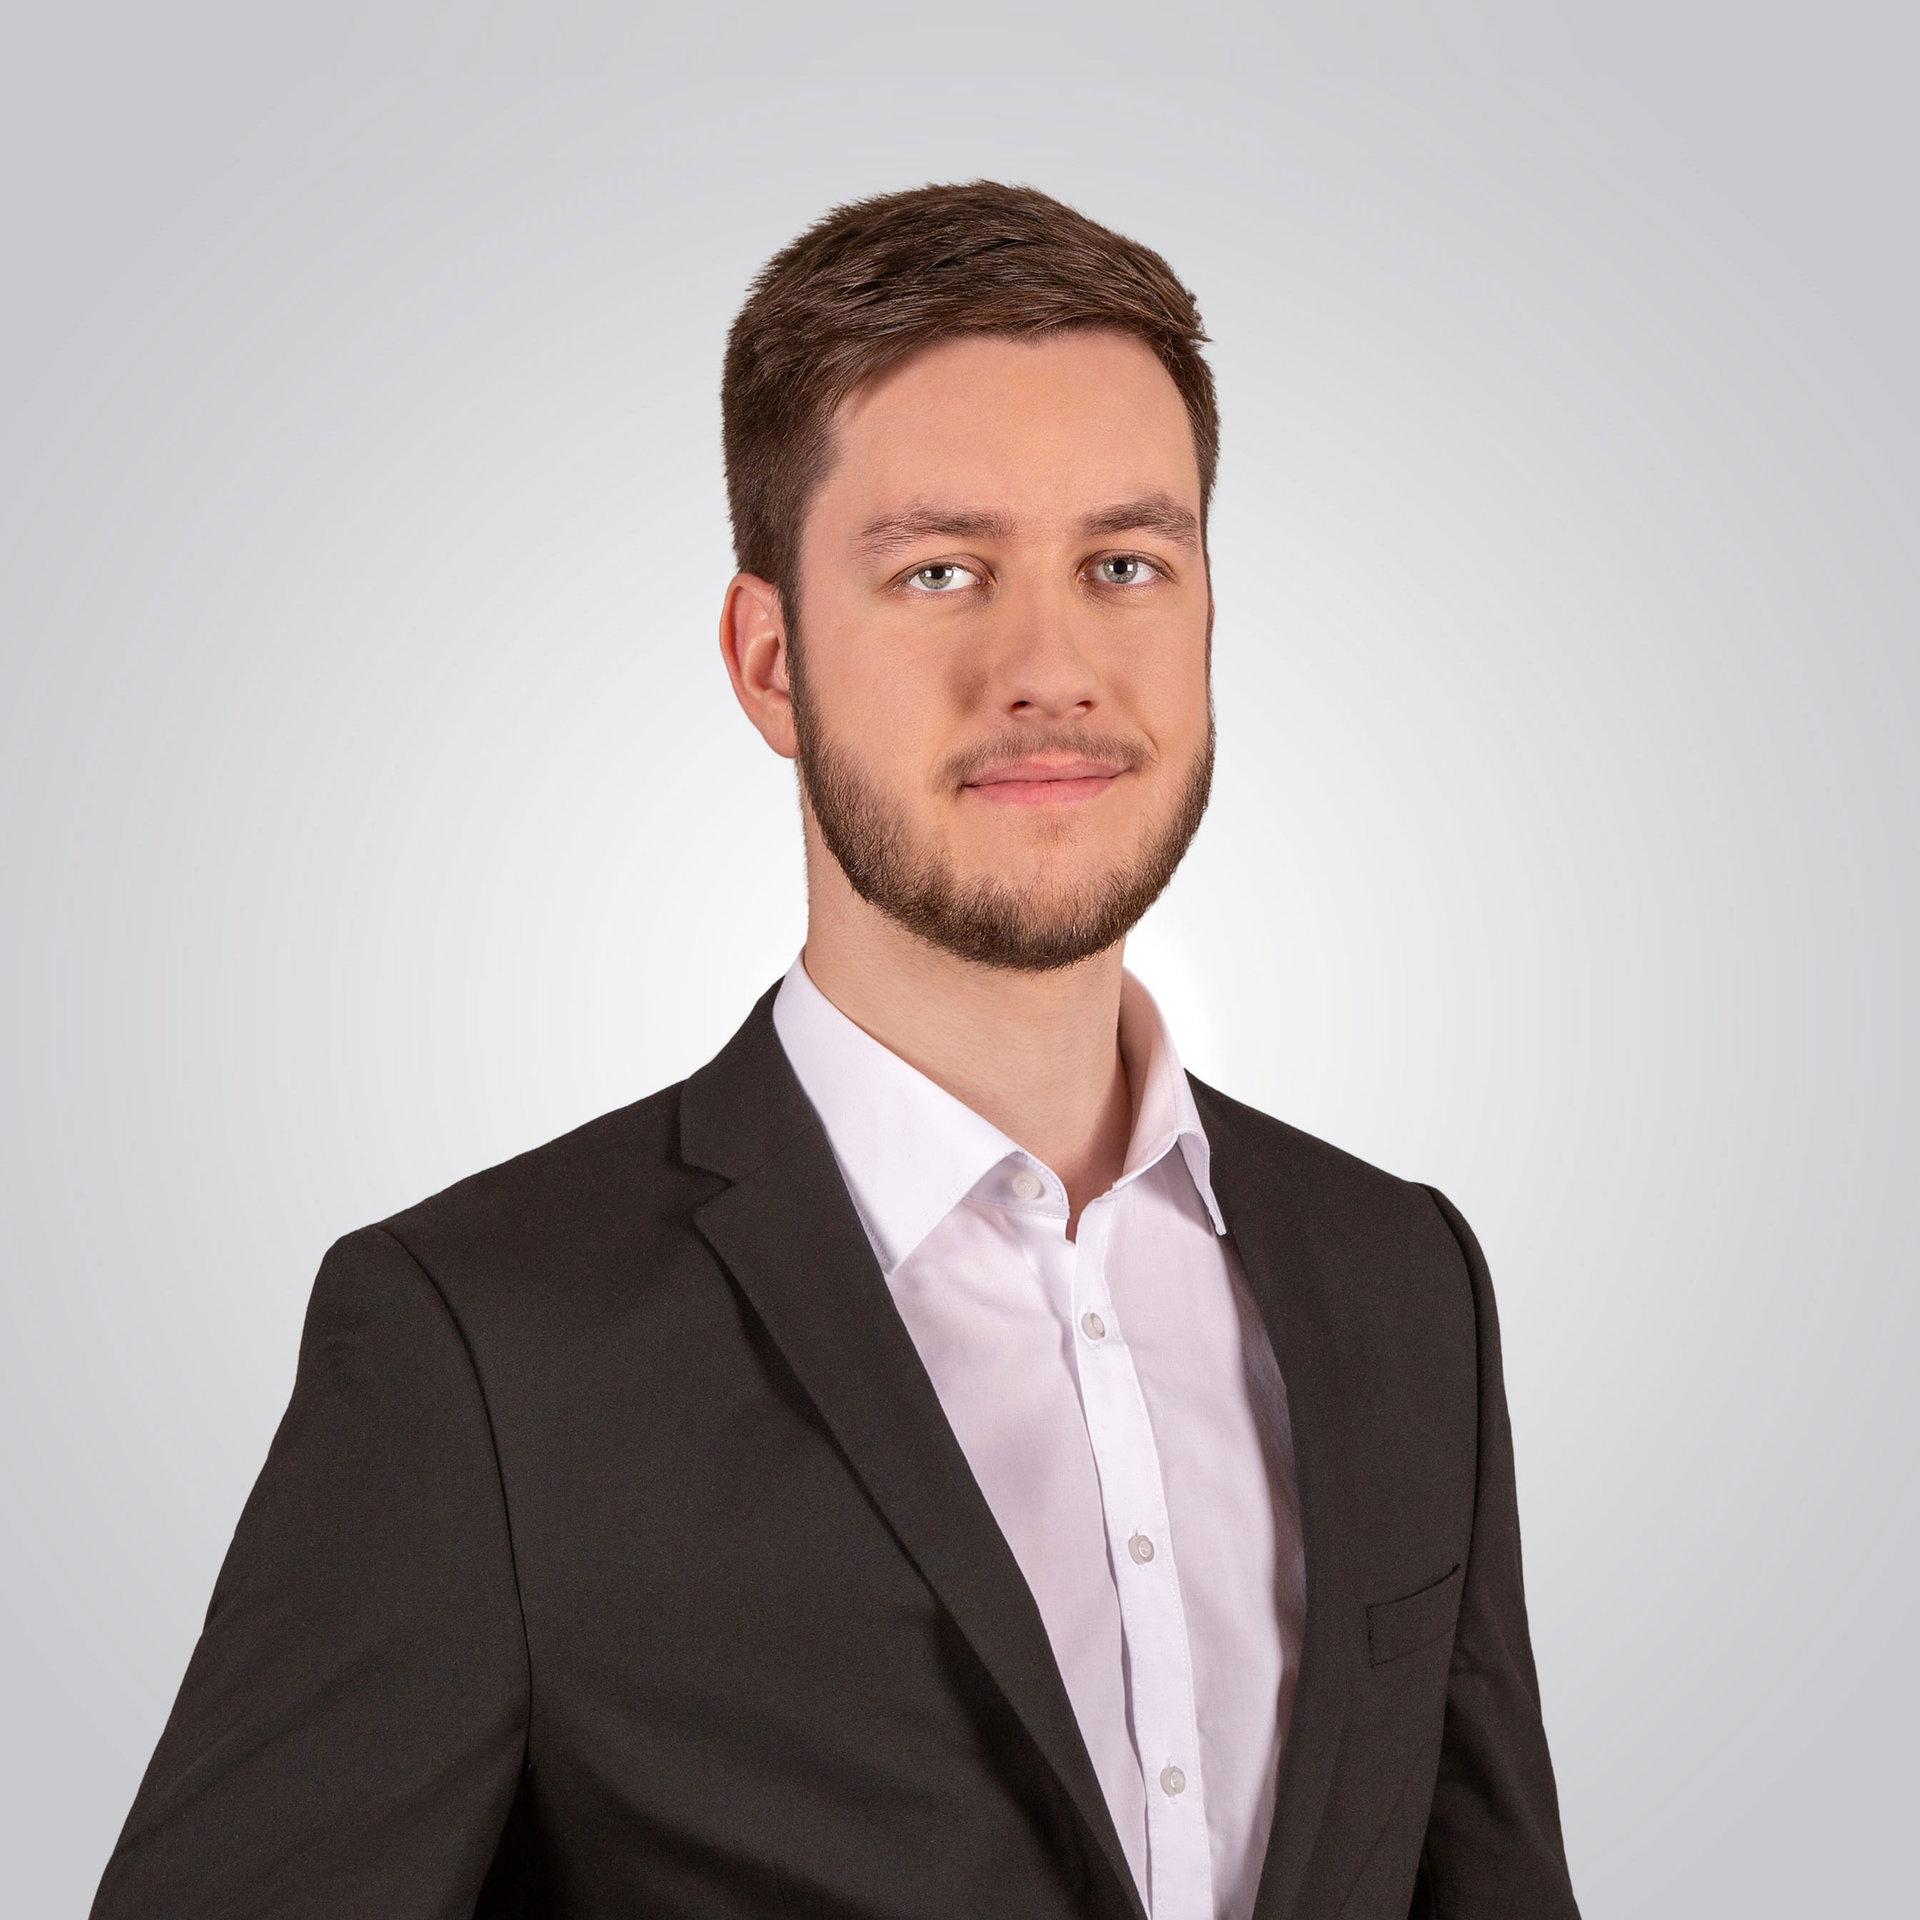 Daniel Triebl | Entwicklung